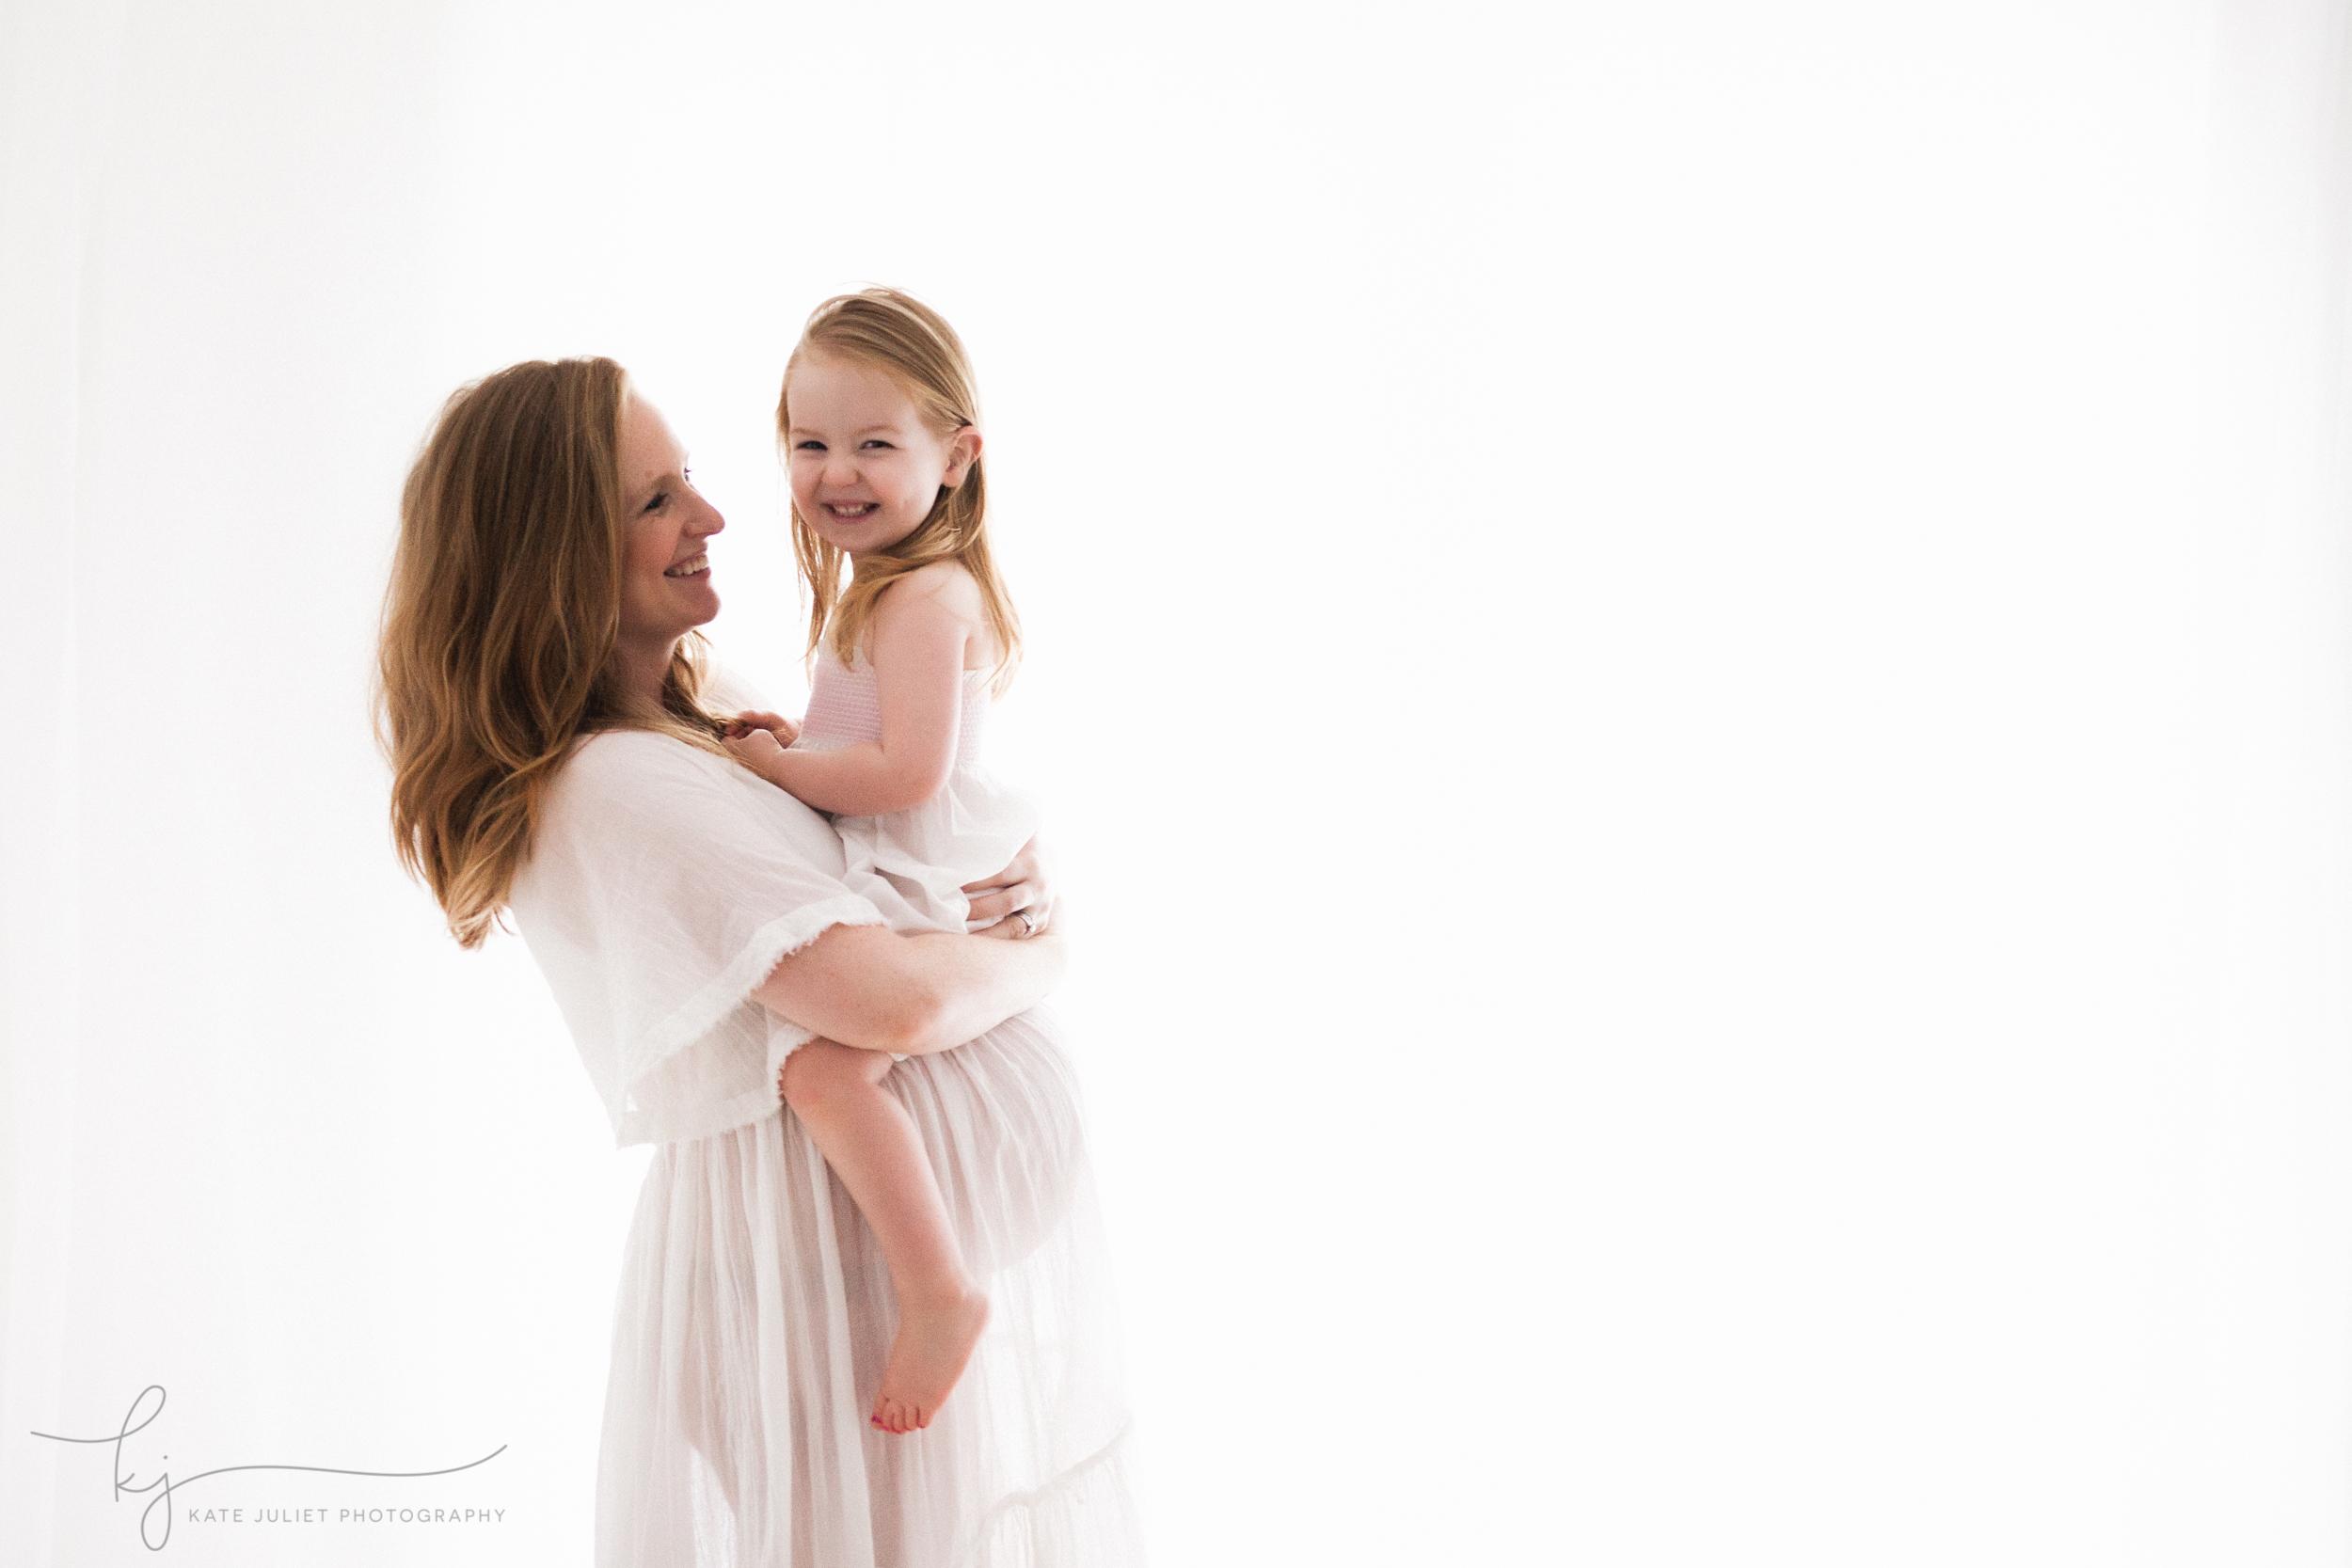 Alexandria VA Maternity and Newborn Photographer | Kate Juliet Photography